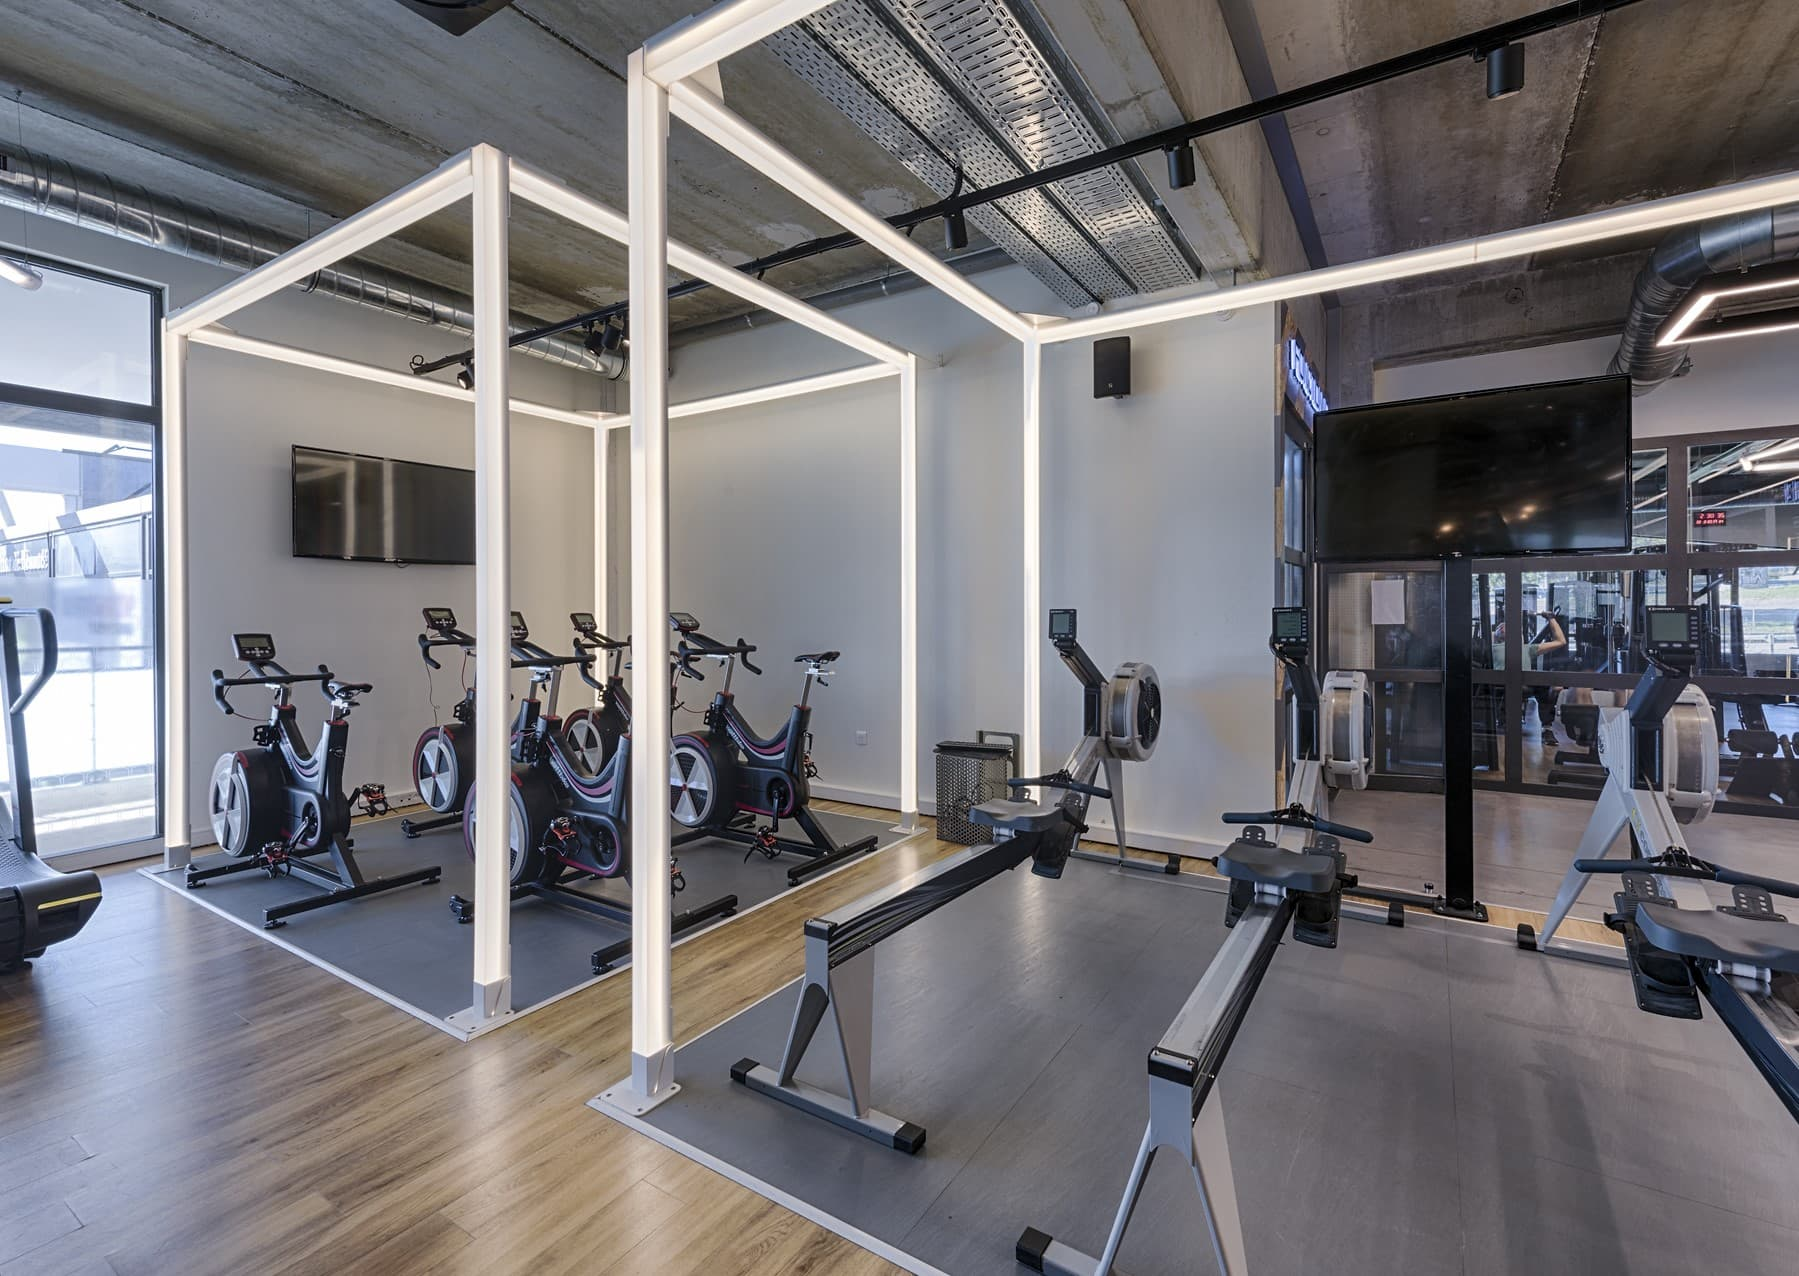 Structure lumineuse dans la salle de sport Métabolik